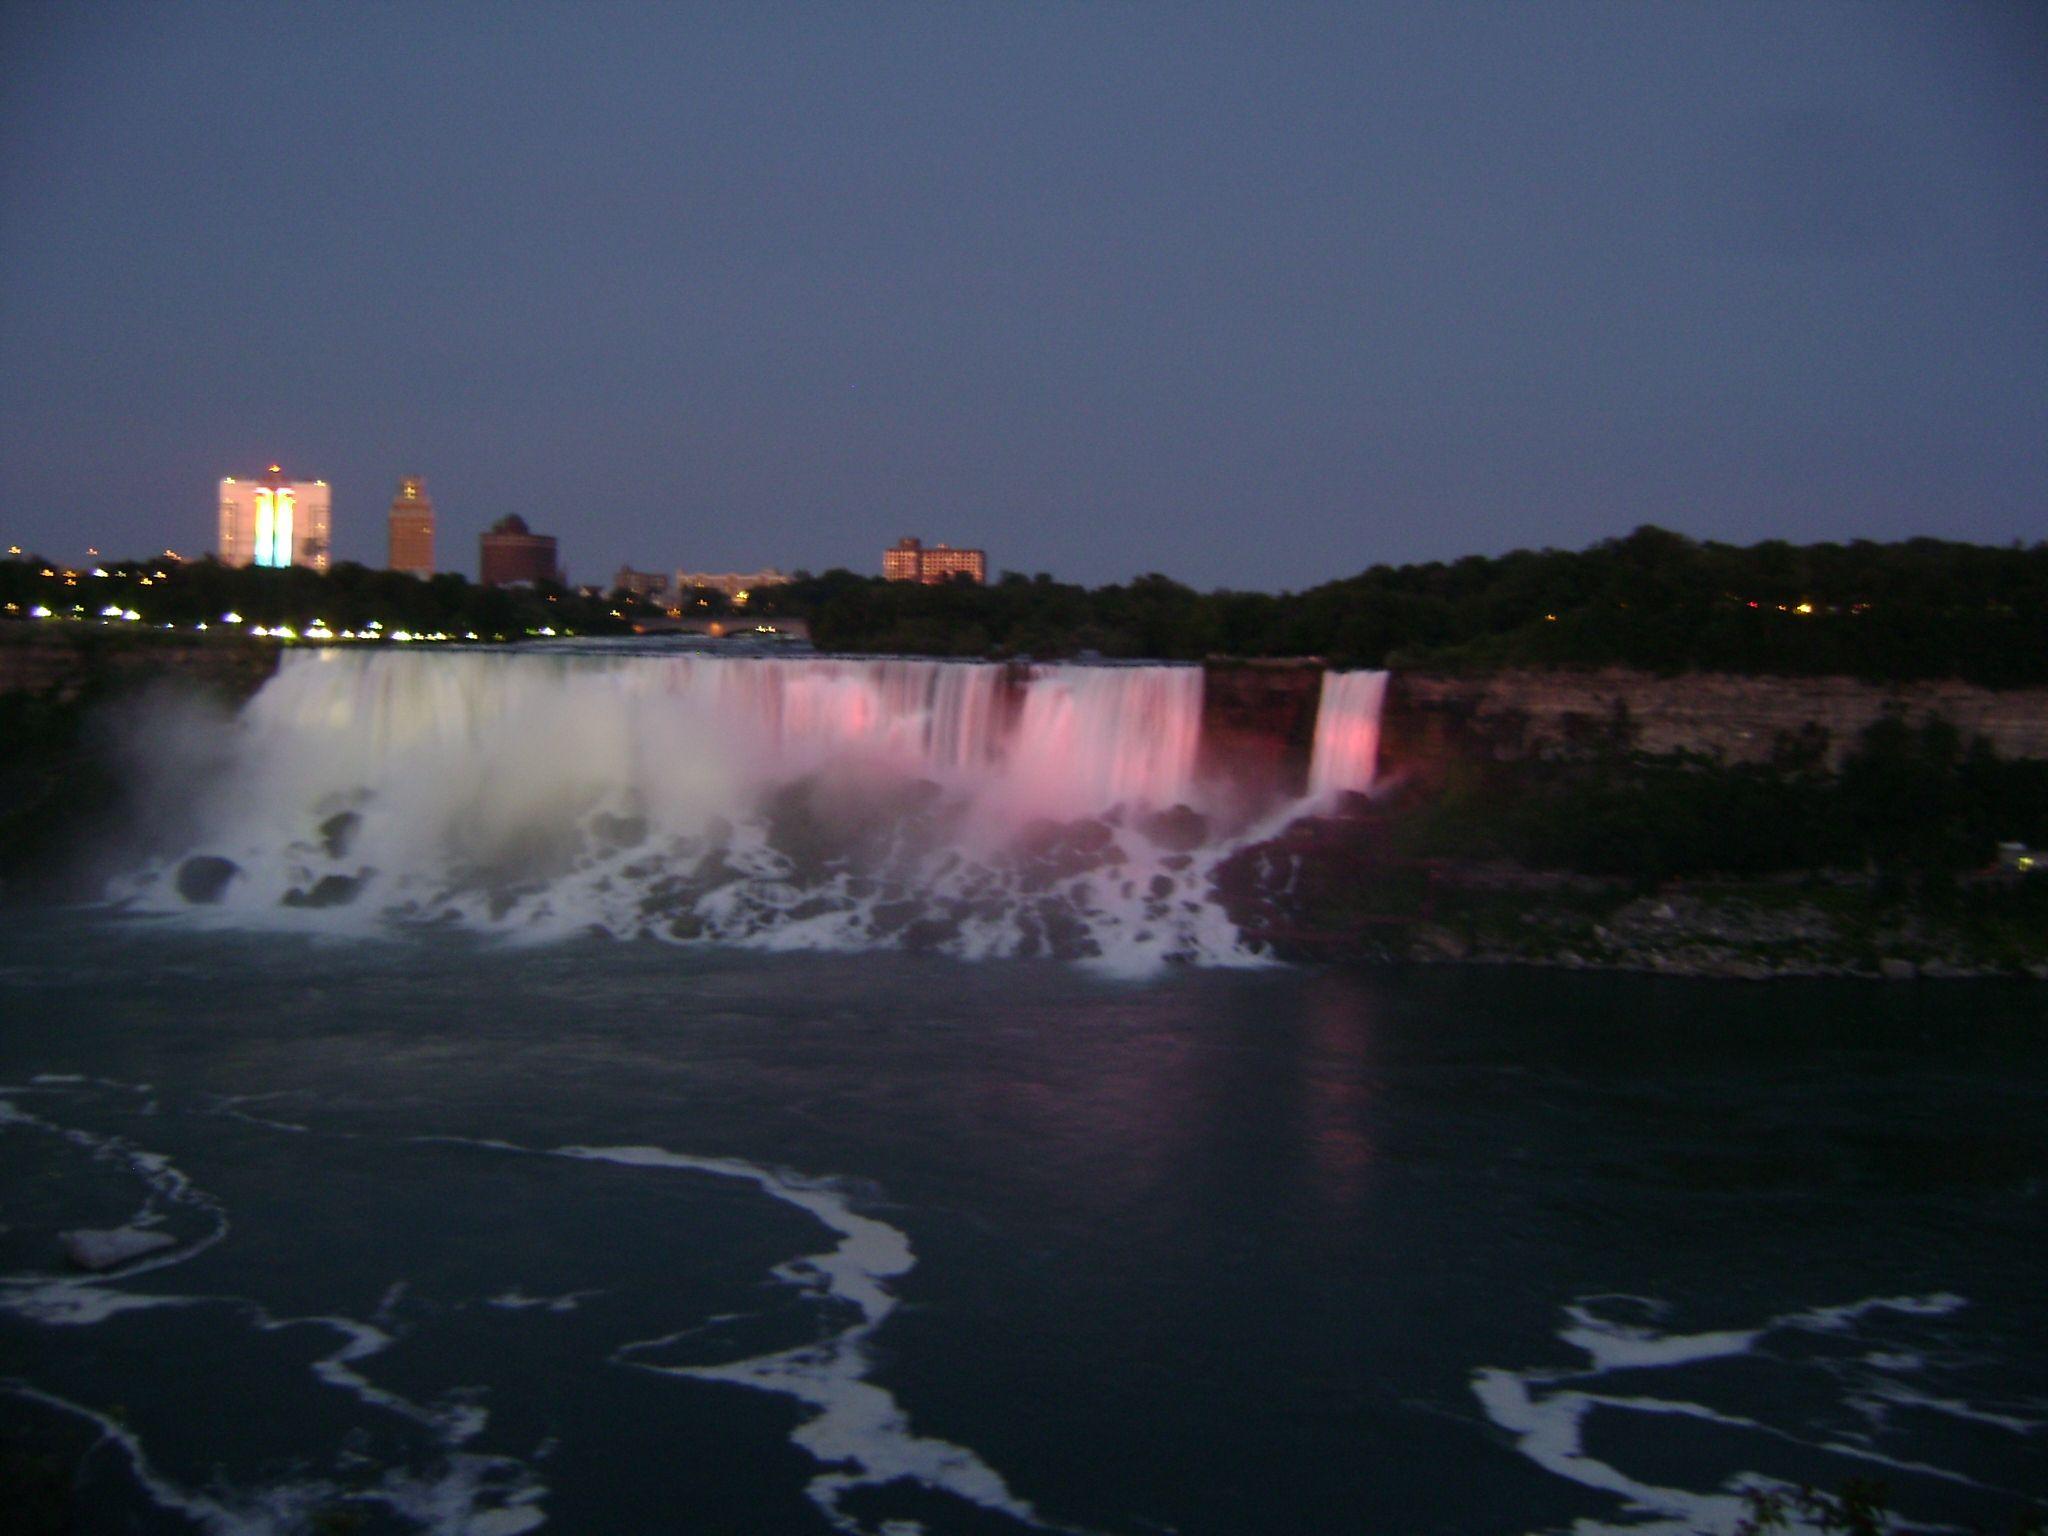 Niagara Falls Canada شلالات نياجرا كندا Natural Landmarks Landmarks Travel